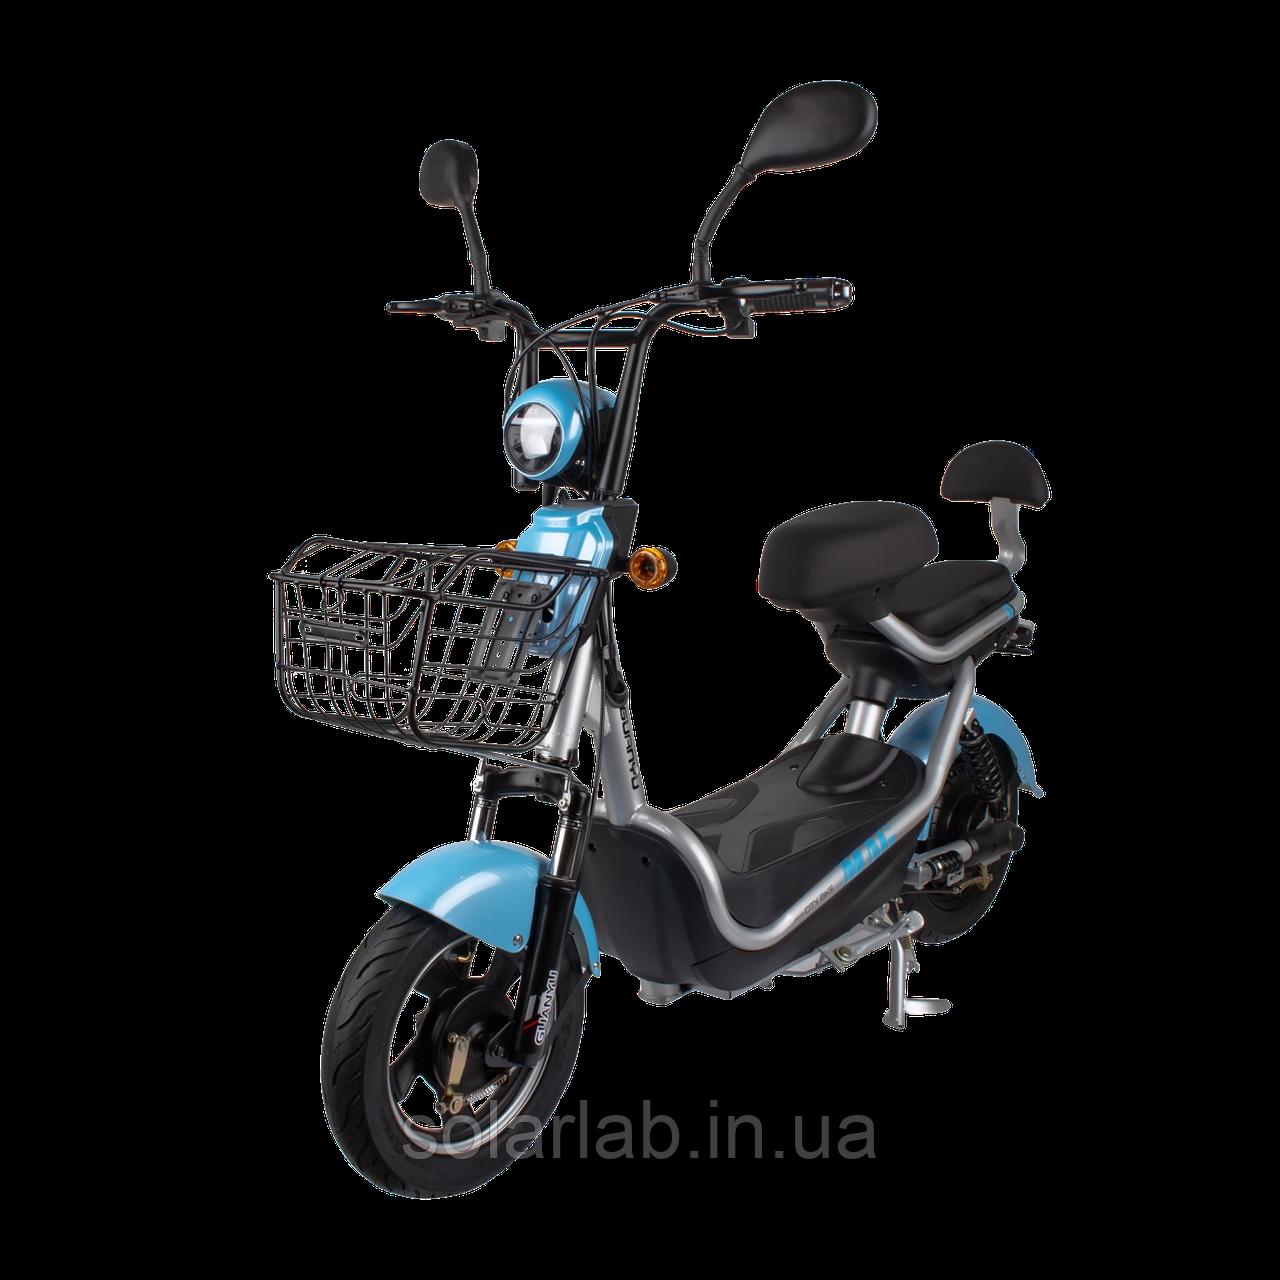 Электрический мопед  CITY gy-4 350W/48V/20AH(DZM) (серо-голубой)